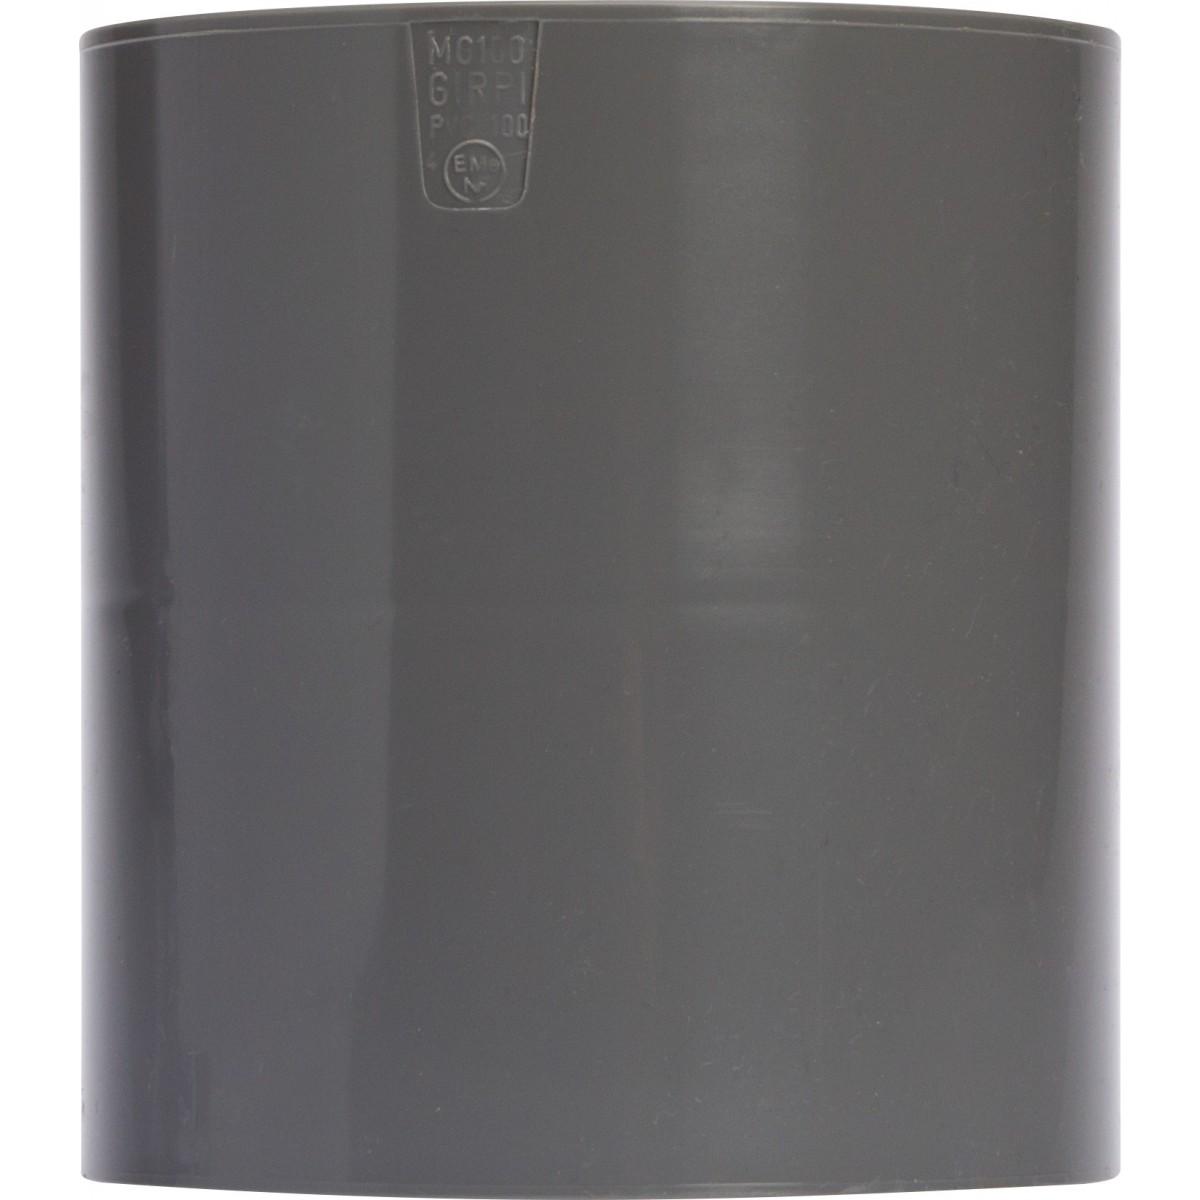 Manchon avec butée intérieure Femelle / Femelle Girpi - Diamètre 40 mm